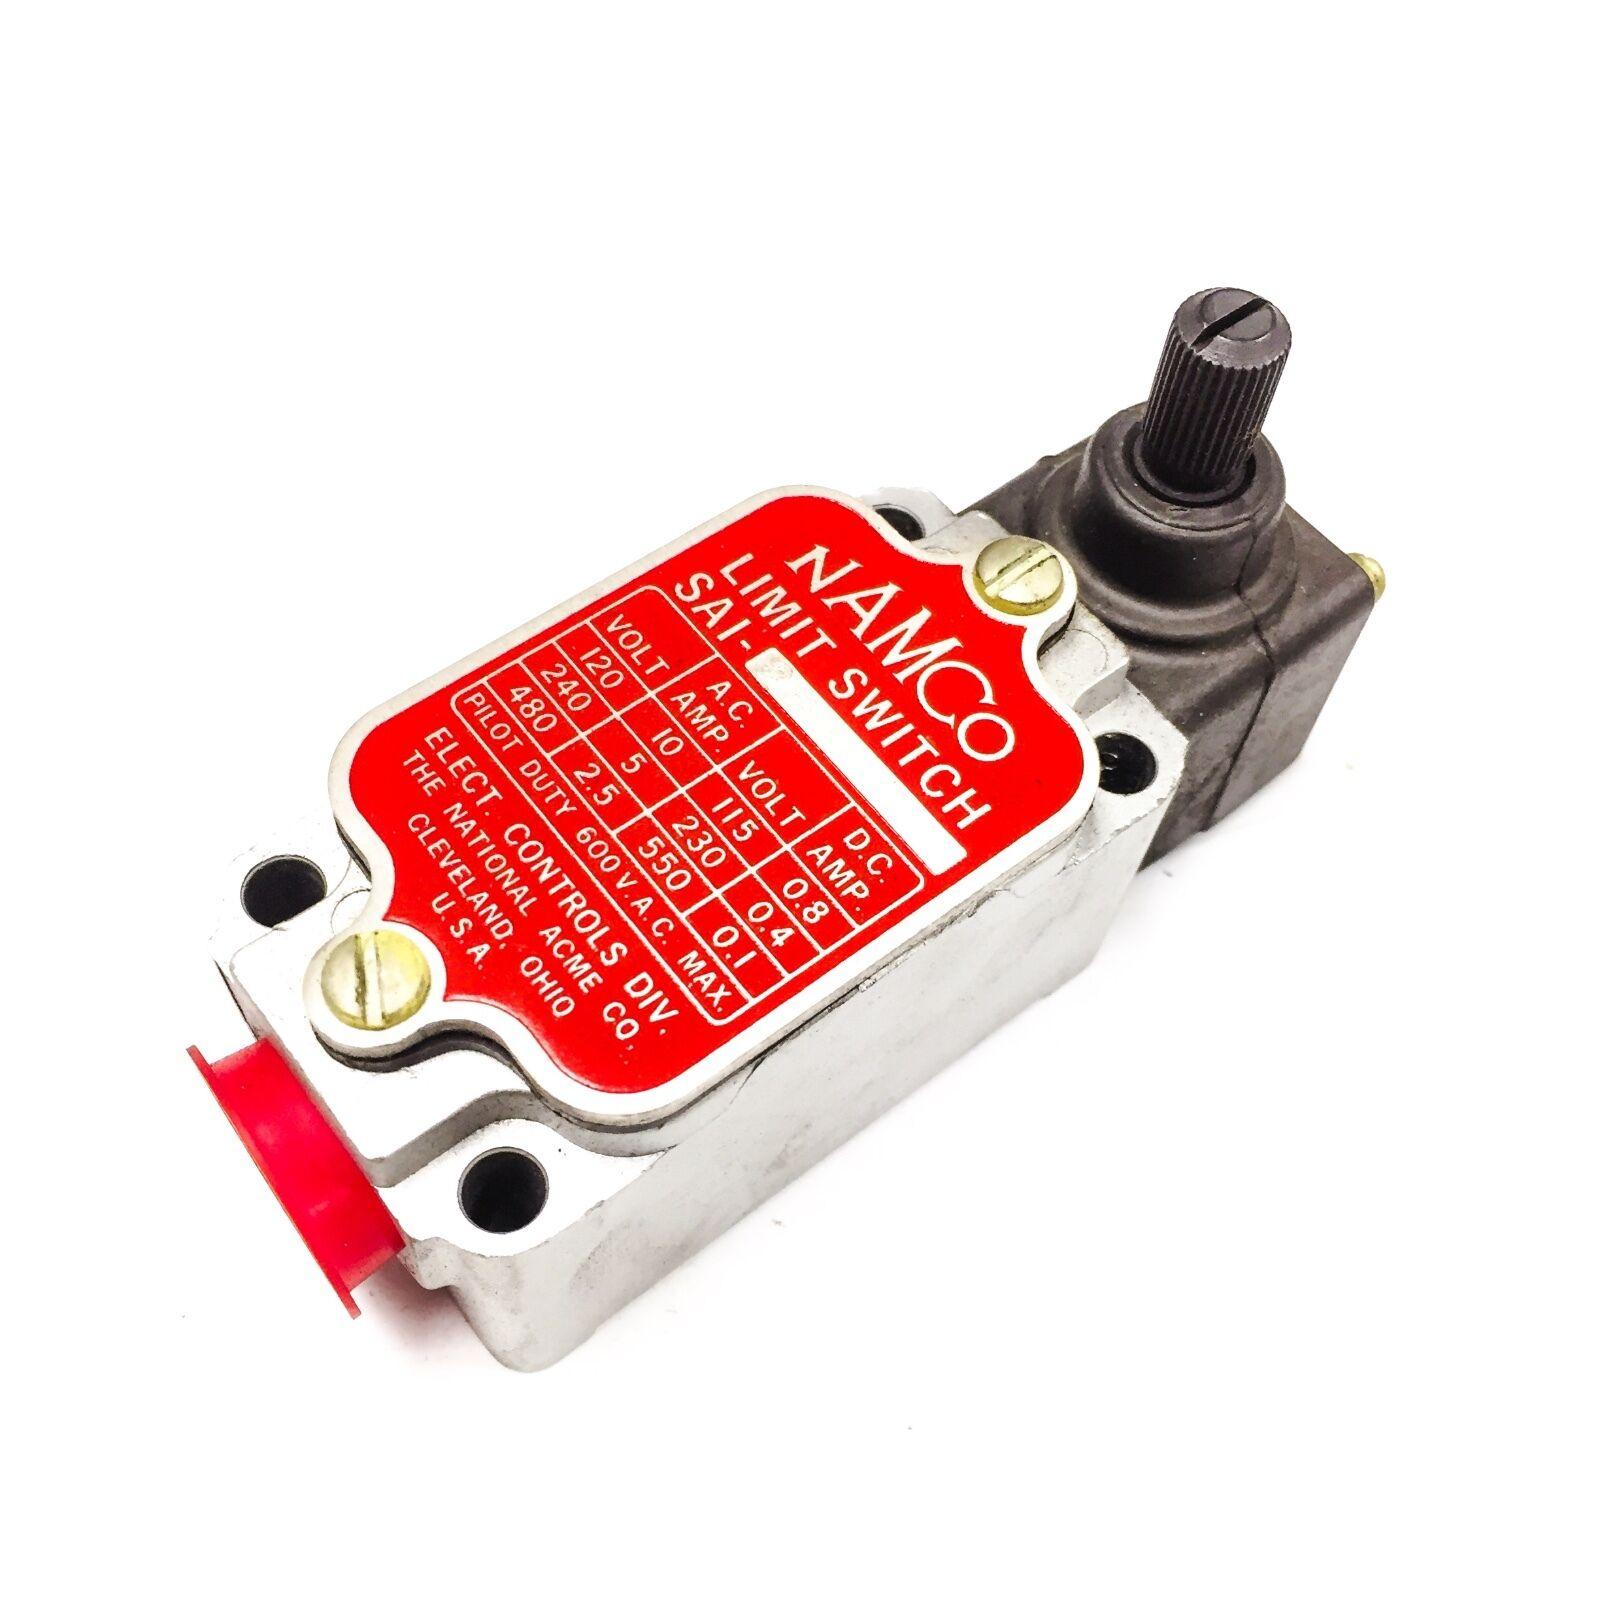 SA1-2 Namco Limit Switch, EA550-0025